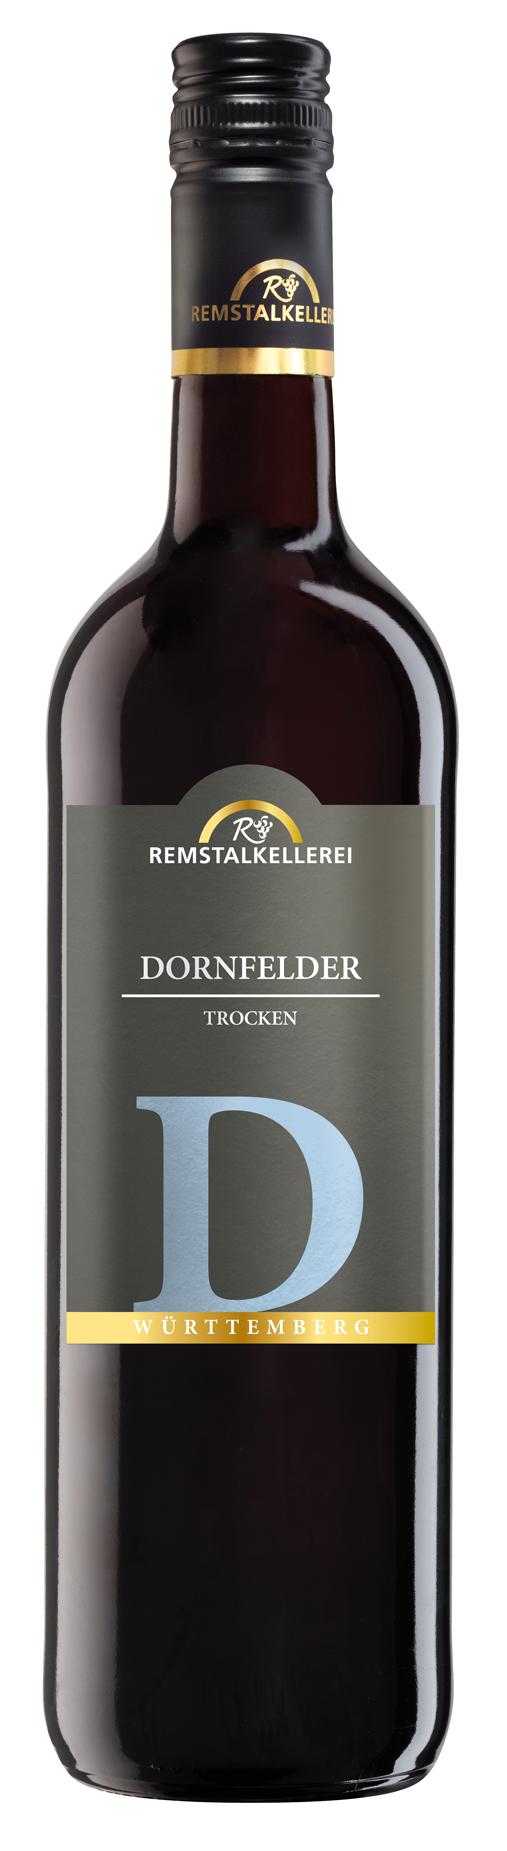 "Dornfelder ""D"" trocken"